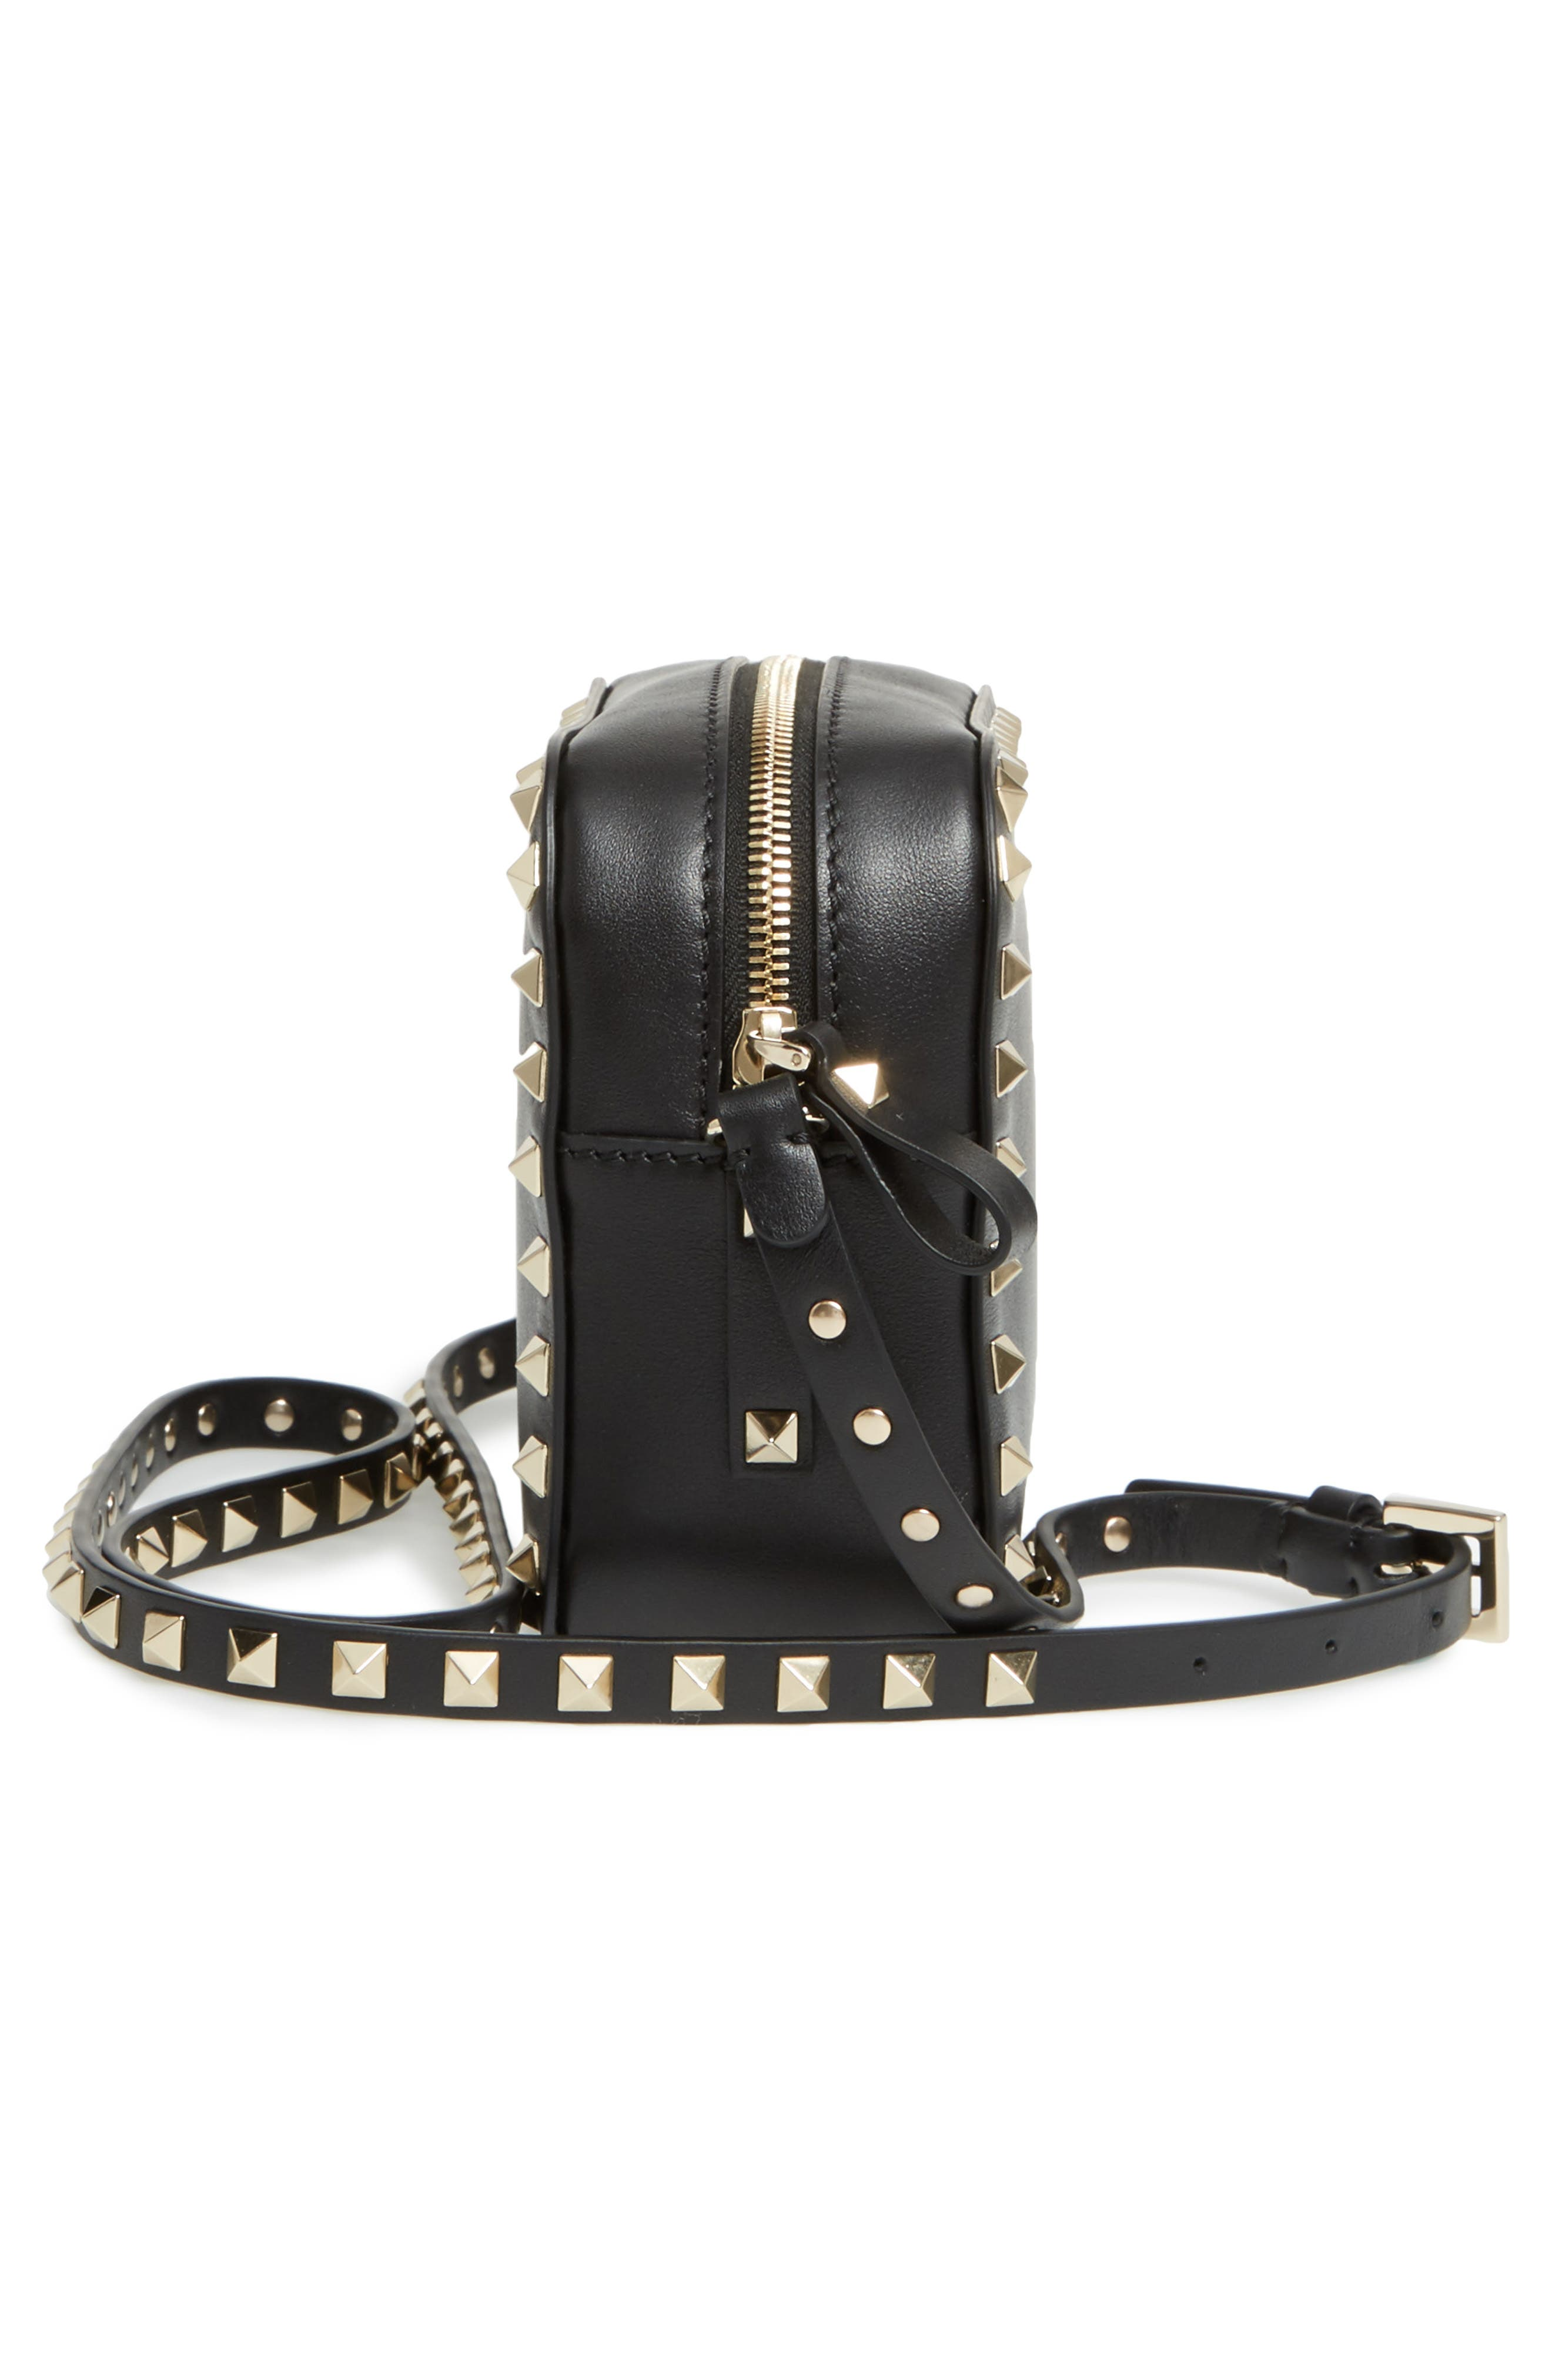 'Rockstud' Calfskin Leather Camera Crossbody Bag,                             Alternate thumbnail 4, color,                             NERO